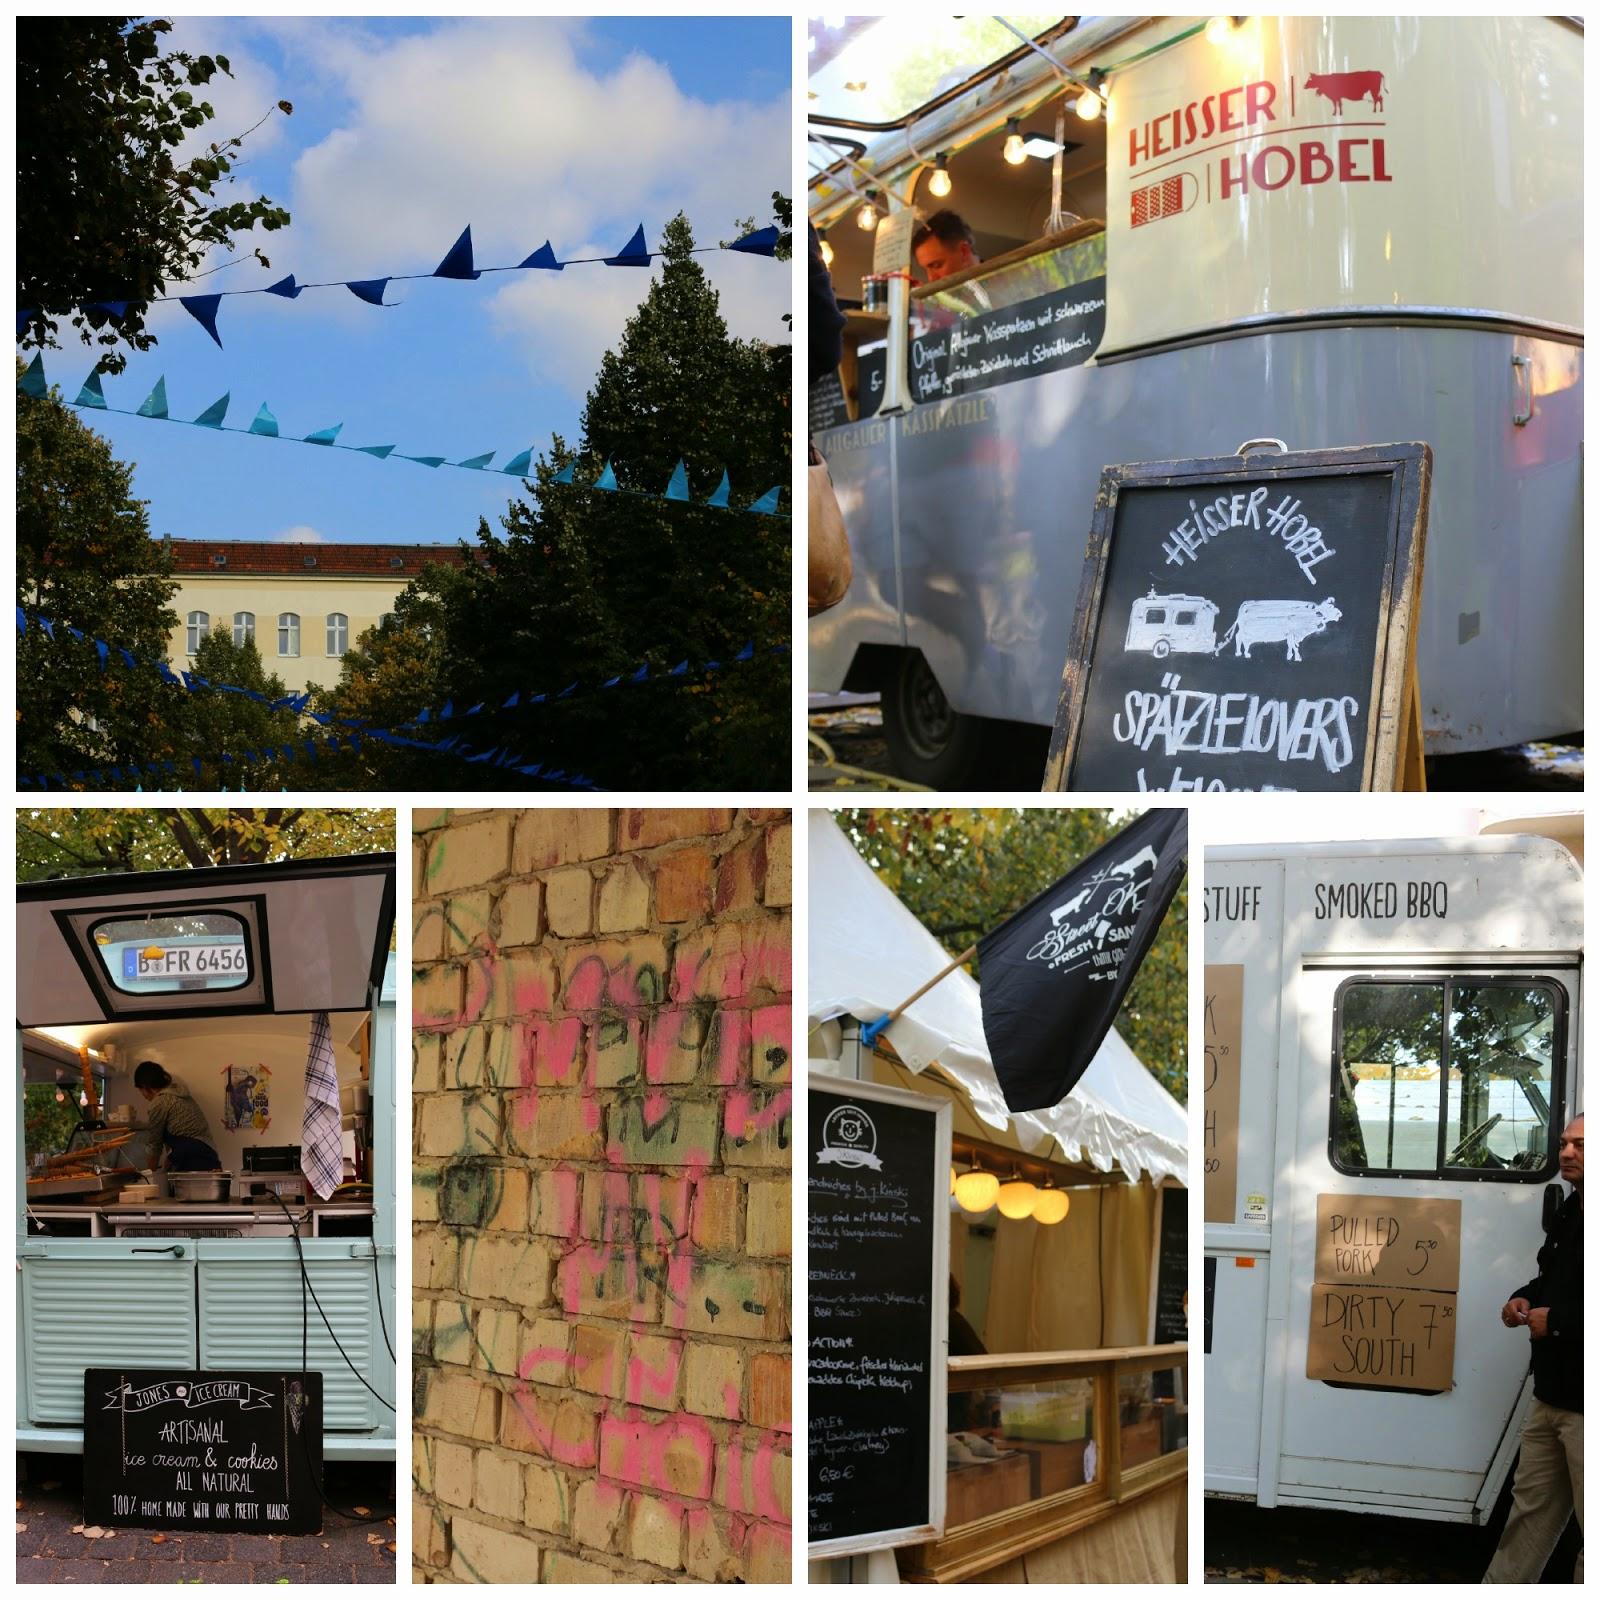 Mauerpark, Arkonaplatz, Street Food Festival, Flohmarkt, Wein, Portugal, Olivenöl